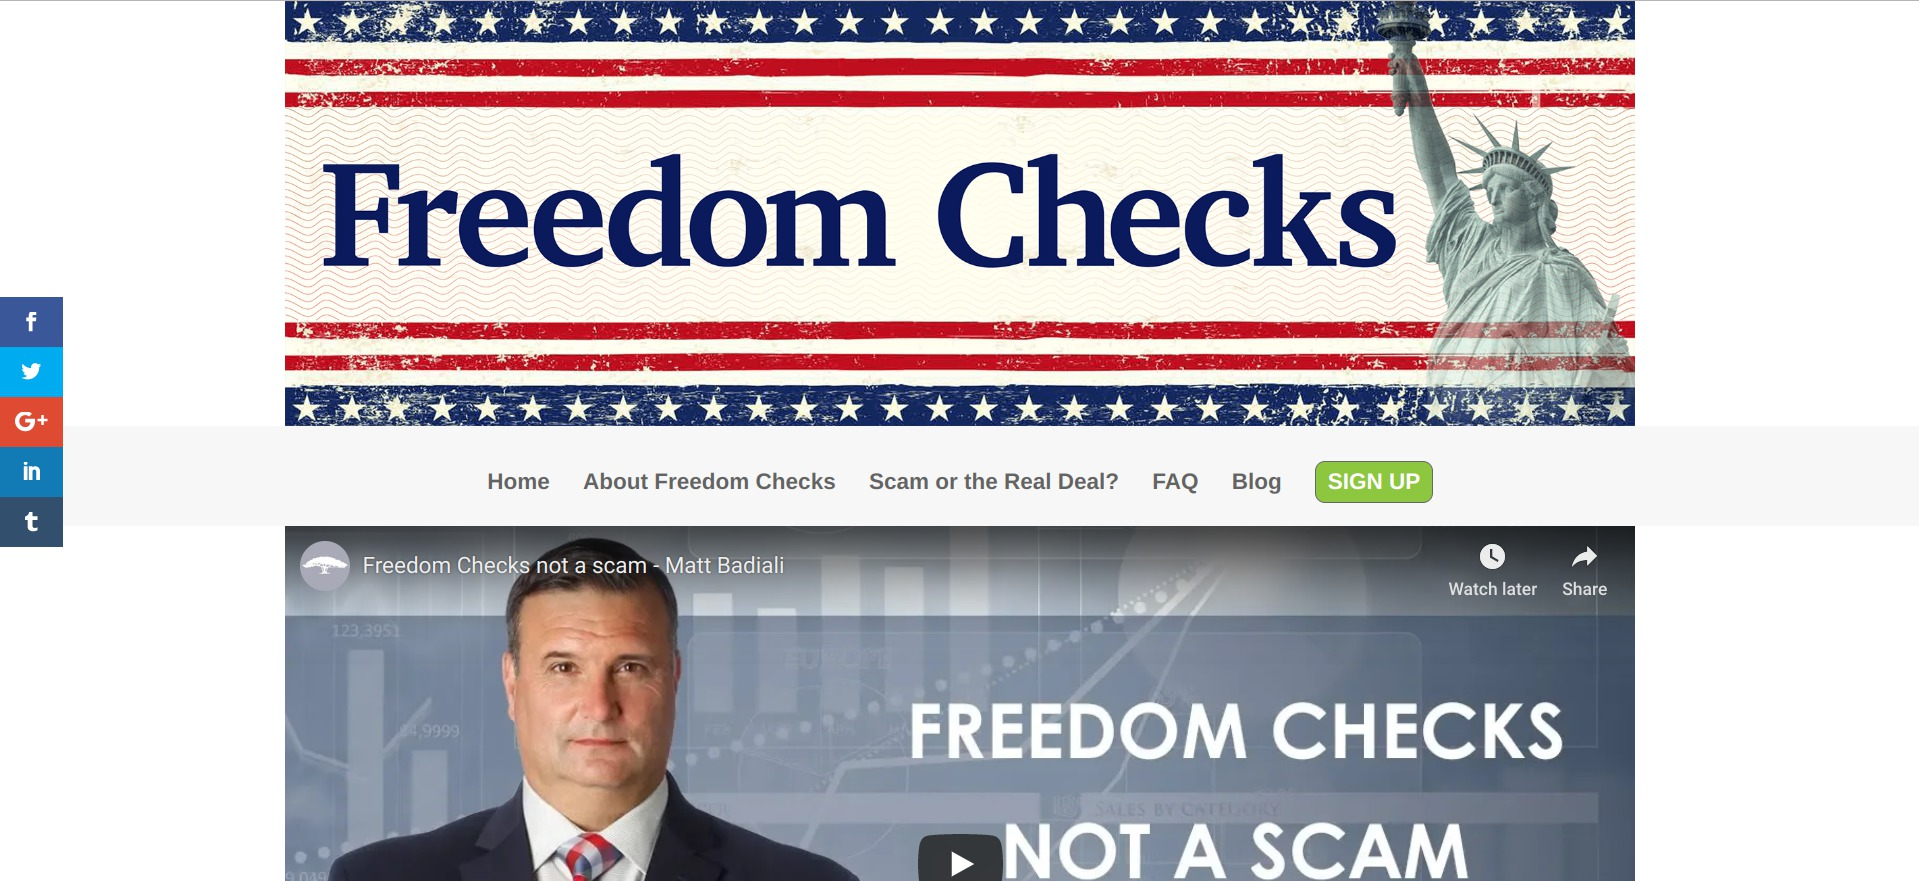 Freedom Checks Scam or Legit